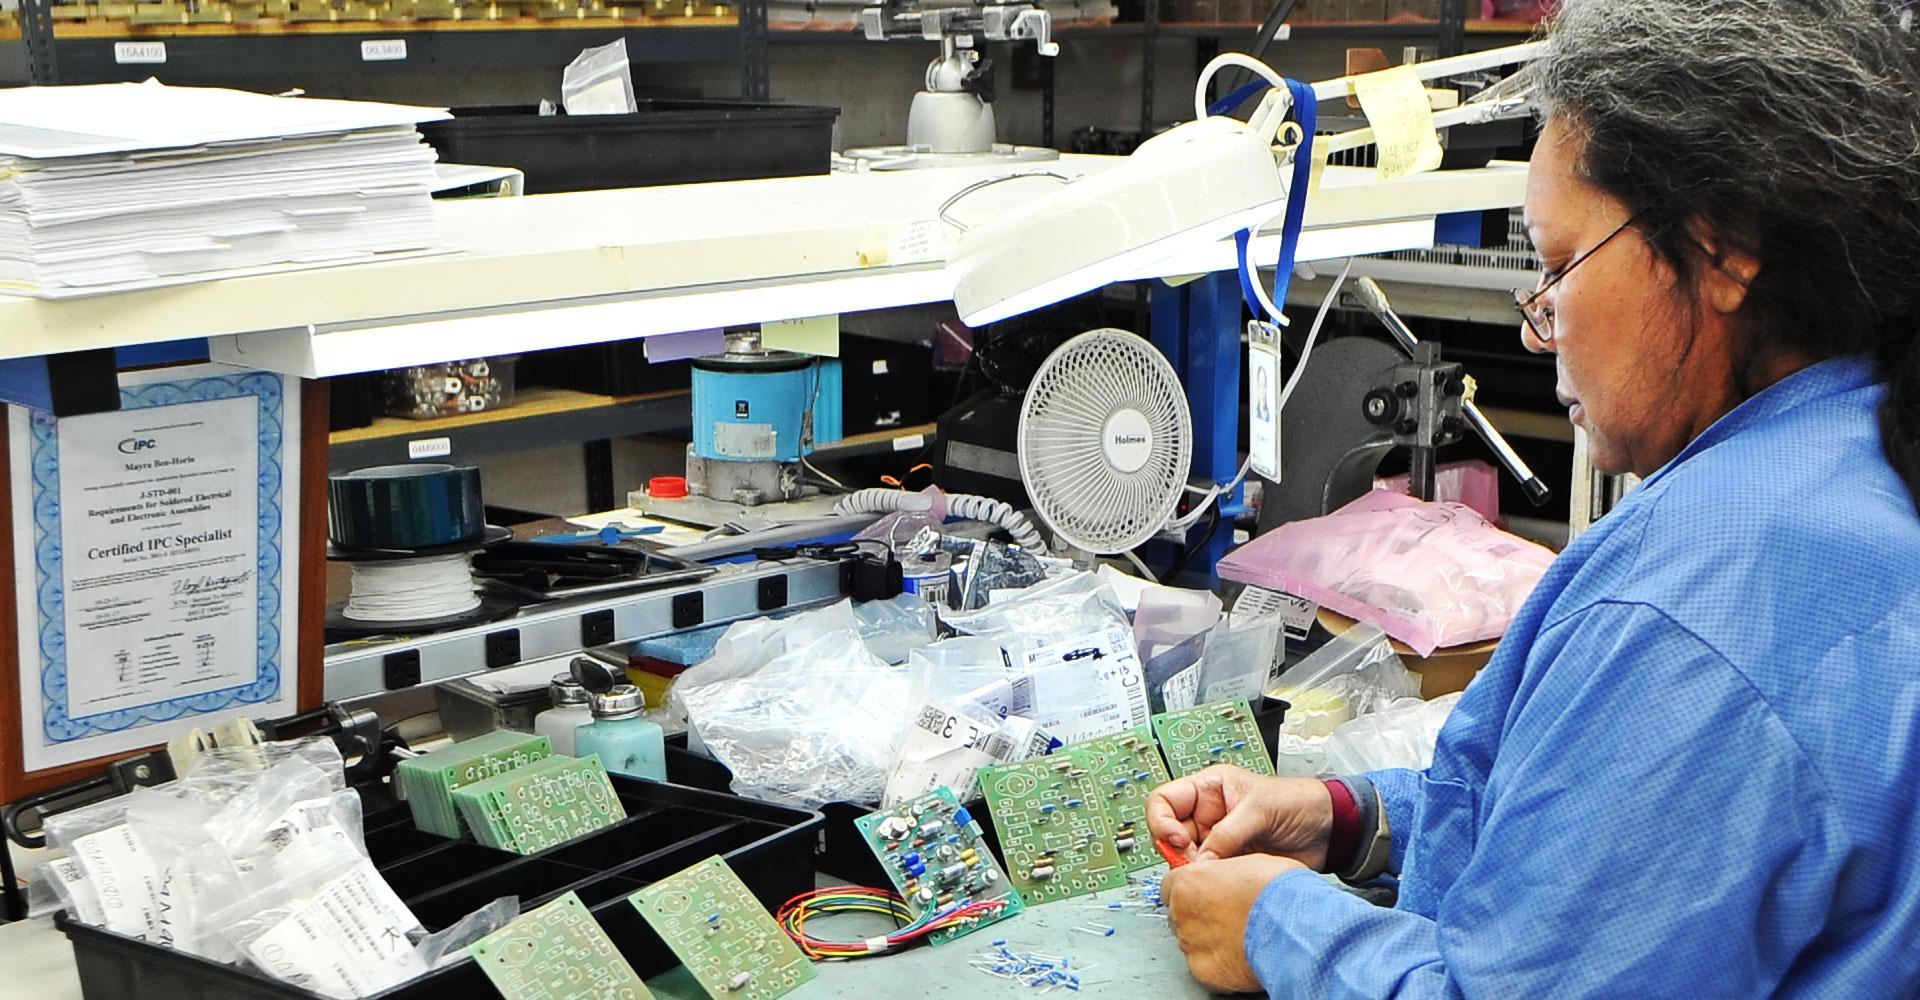 Engineered Magnetics - Aerospace Component Manufacturer: Facility Slide 10